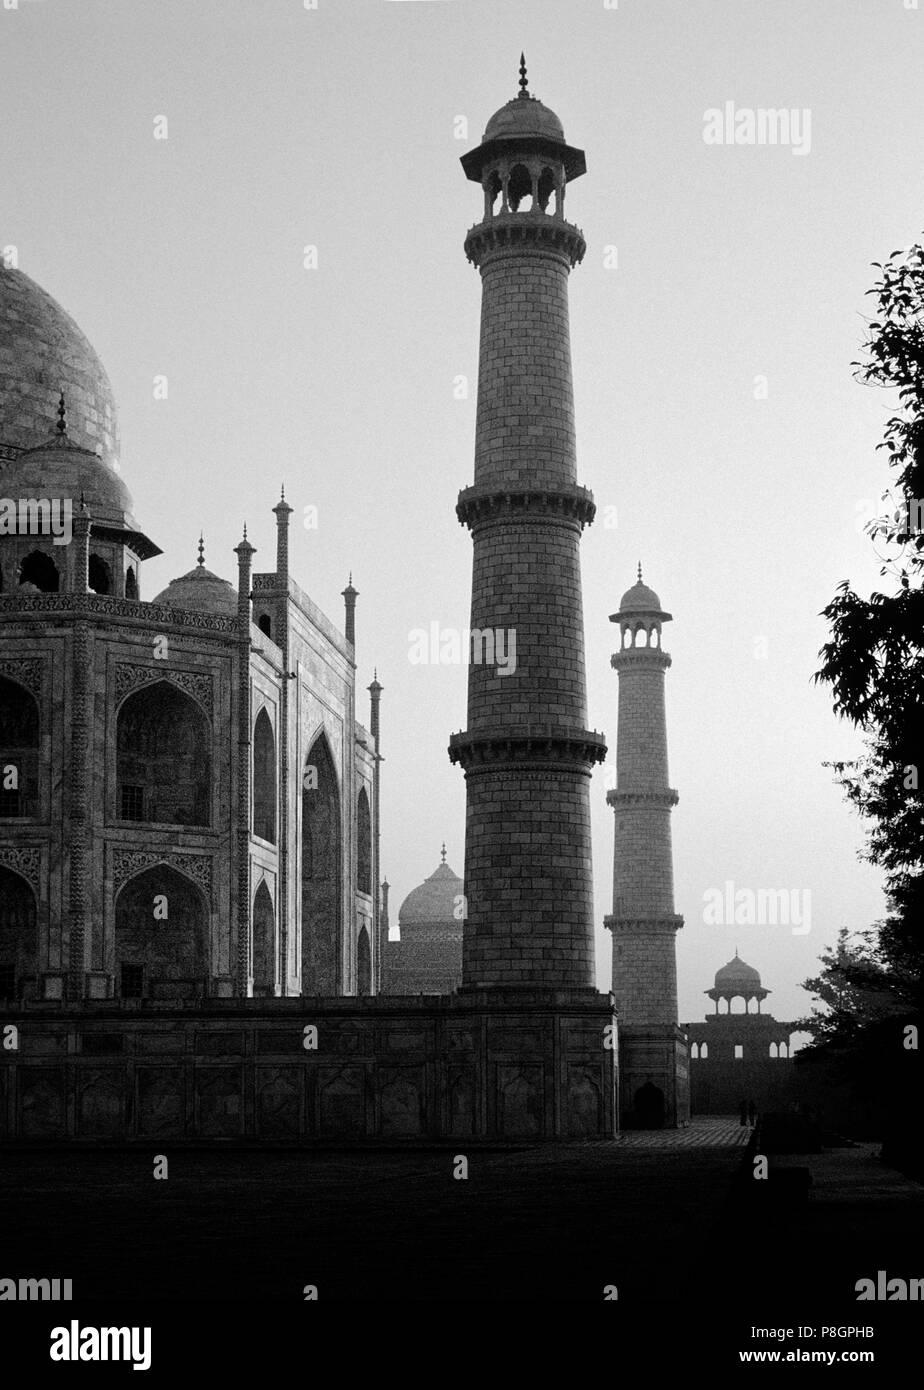 SUNRISE sui minareti al Taj Mahal - AGRA, INDIA Immagini Stock